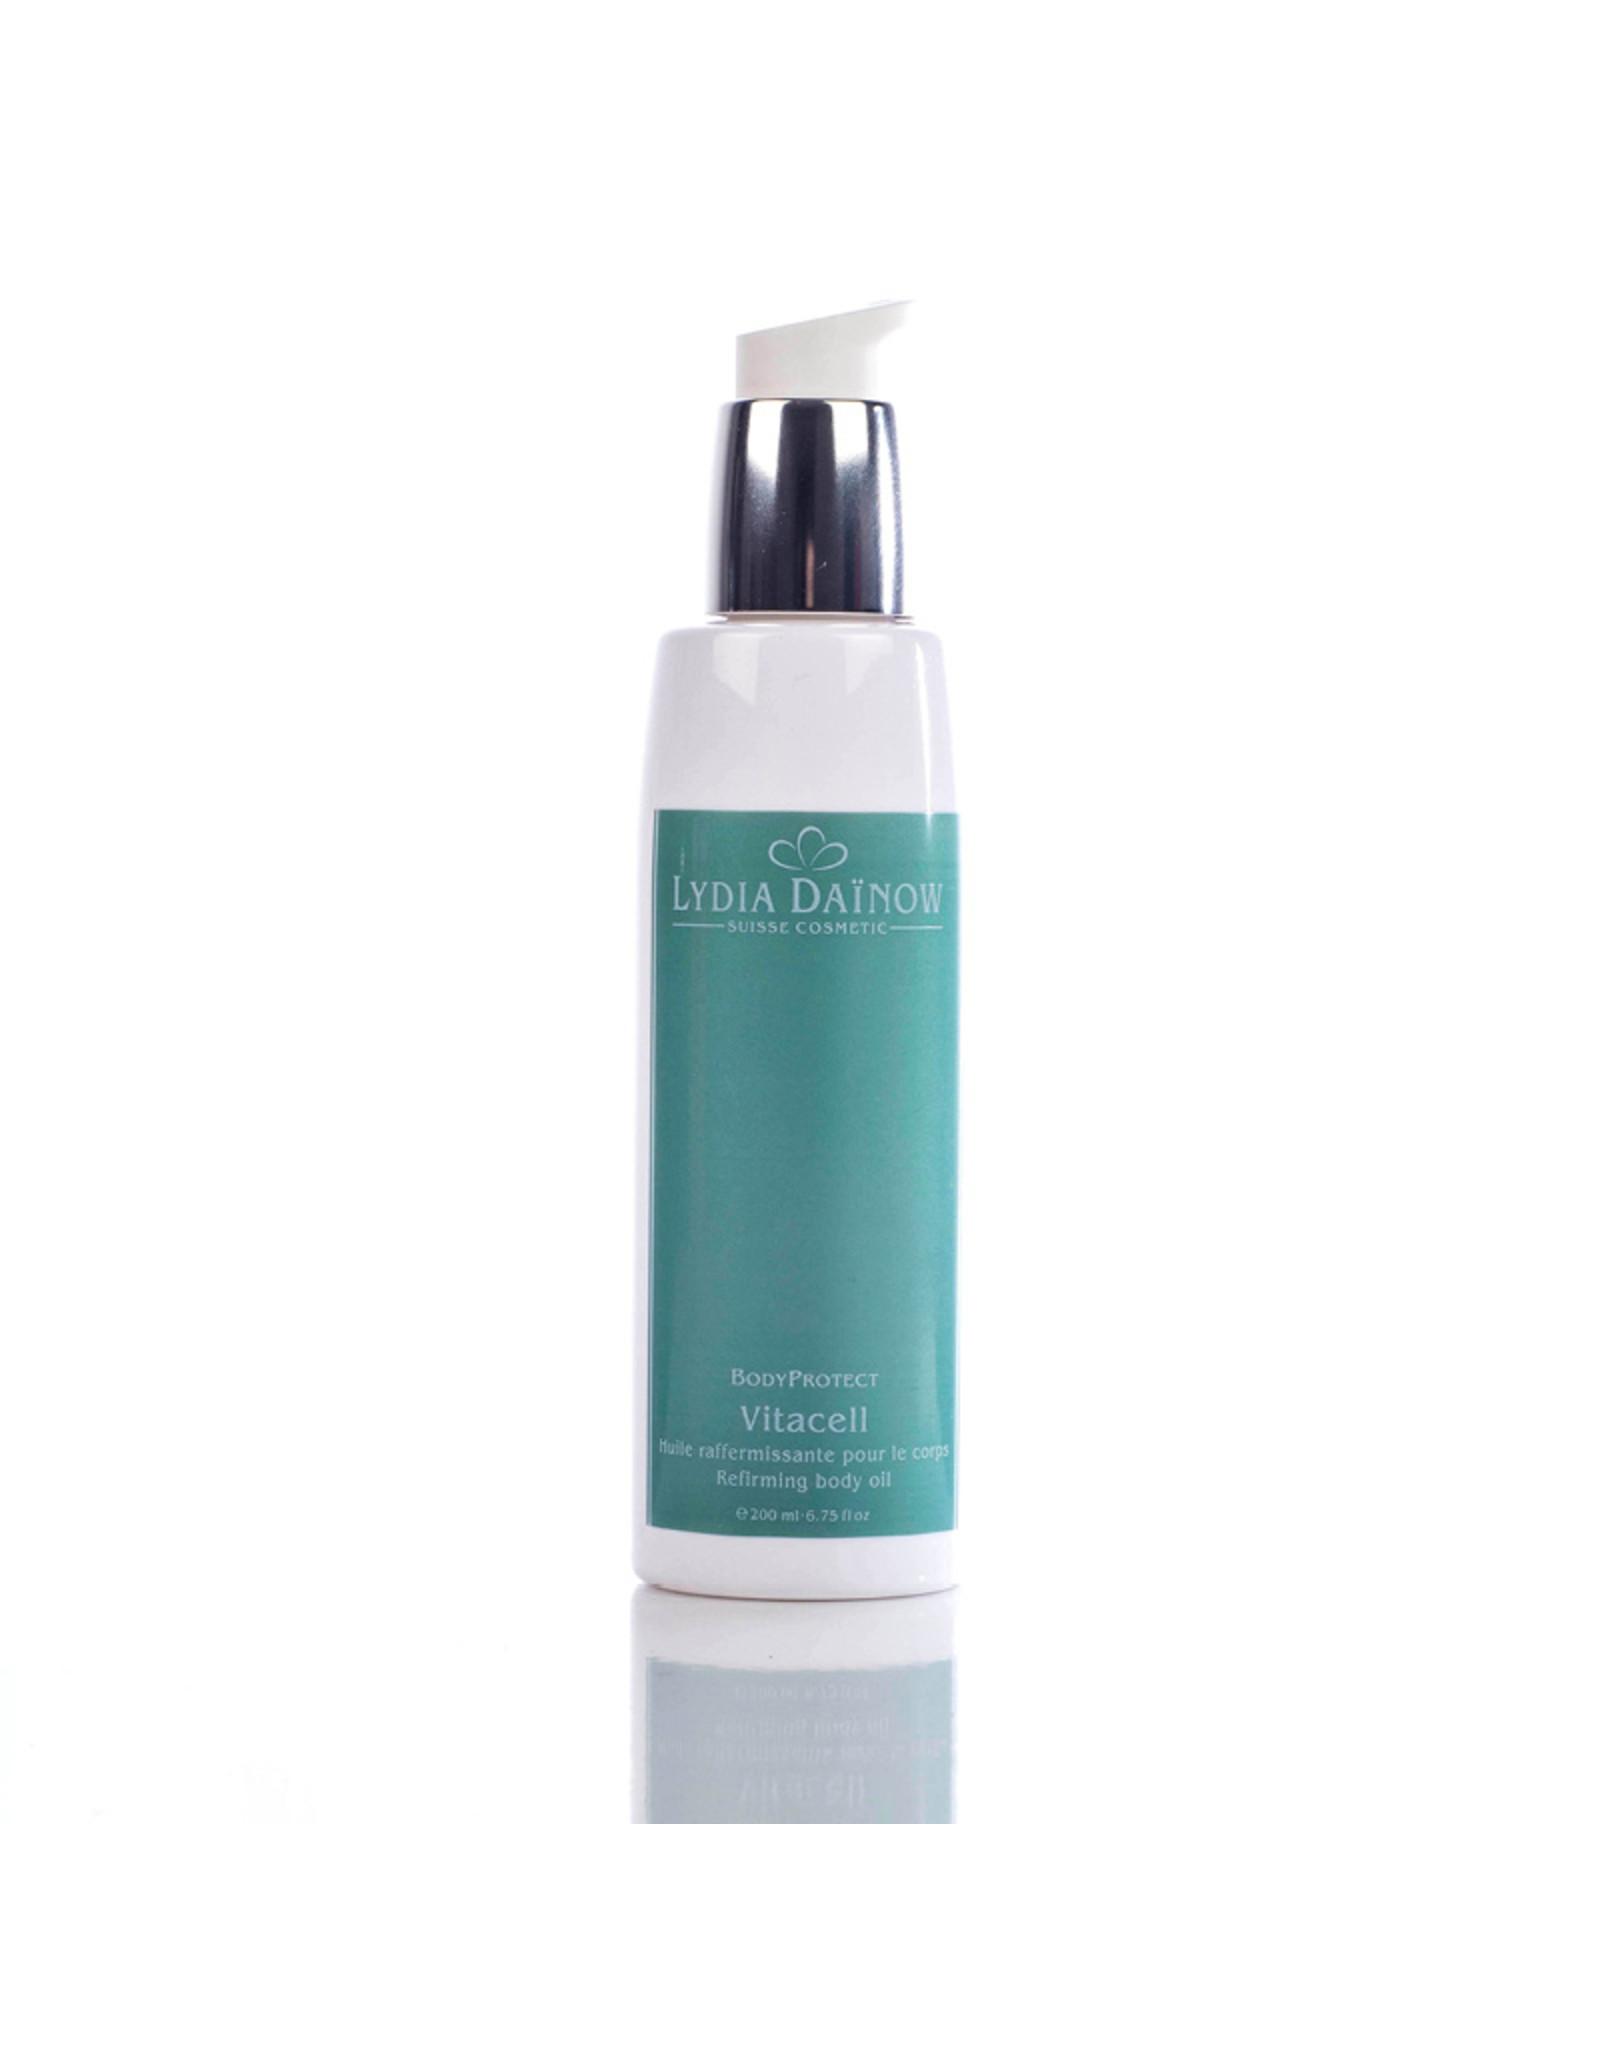 Lydïa Dainow Body Protect - Firming body oil